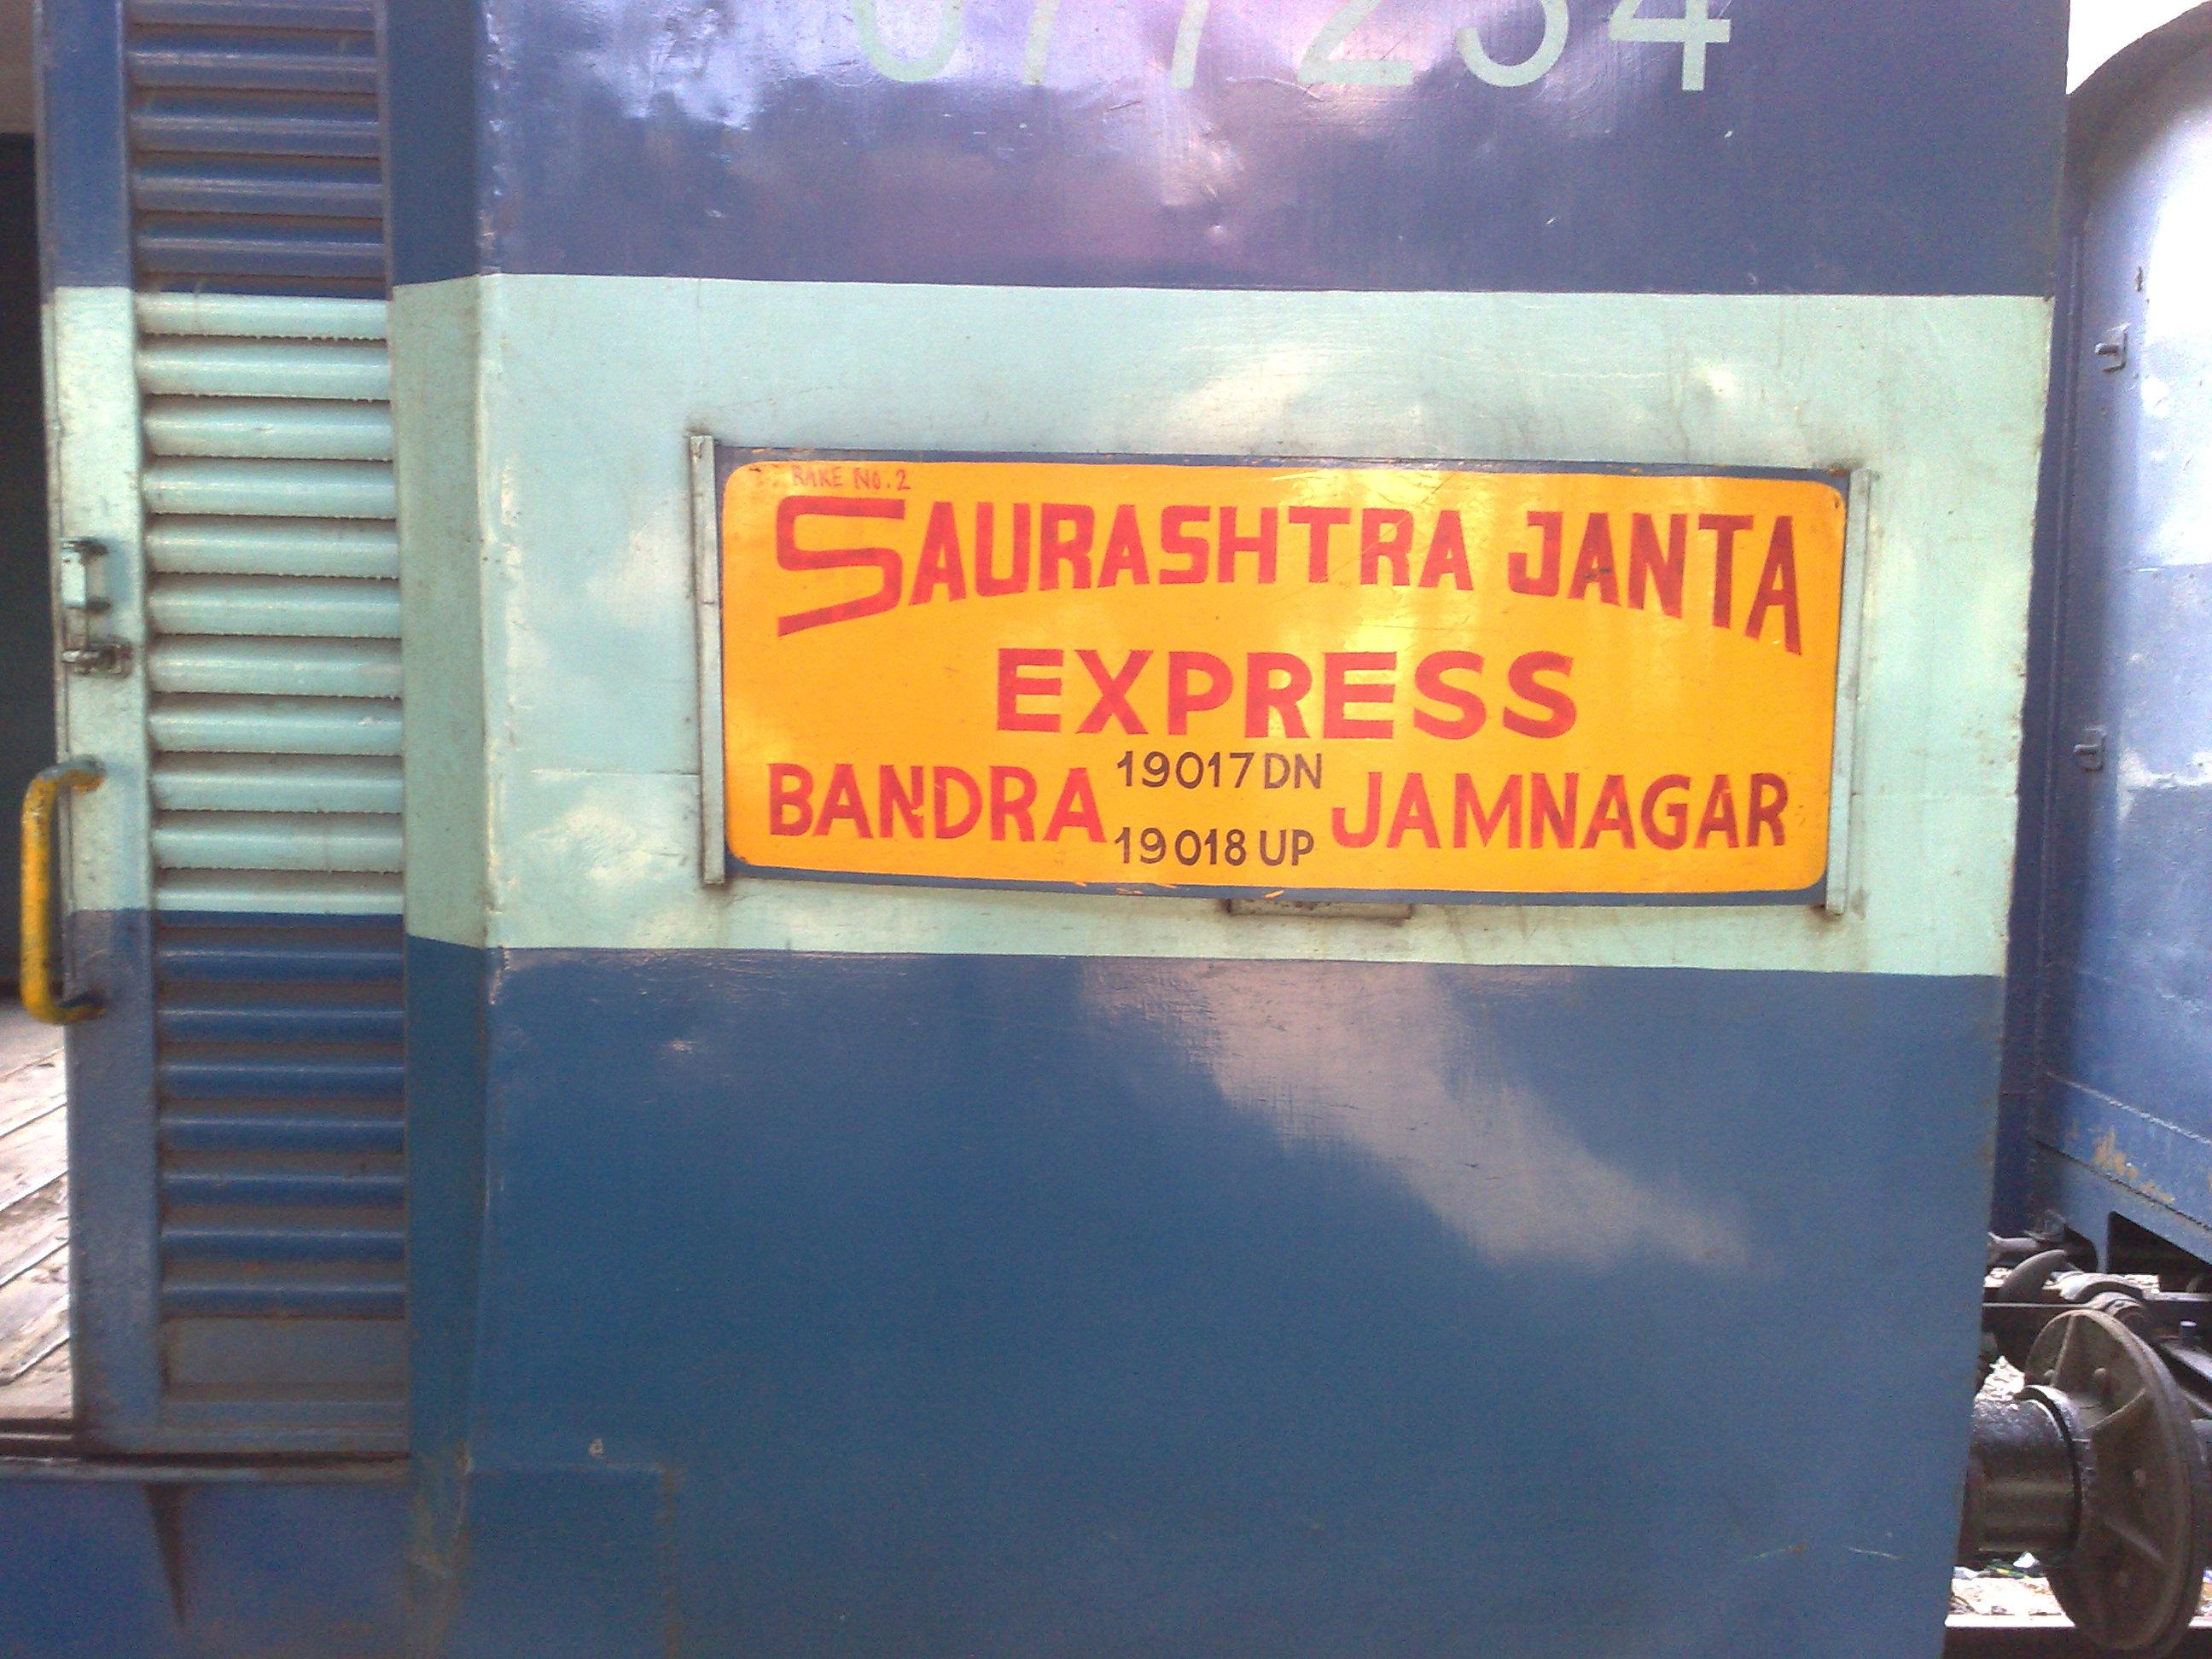 Bandra Terminus Jamnagar Saurashtra Janta Express - Wikipedia